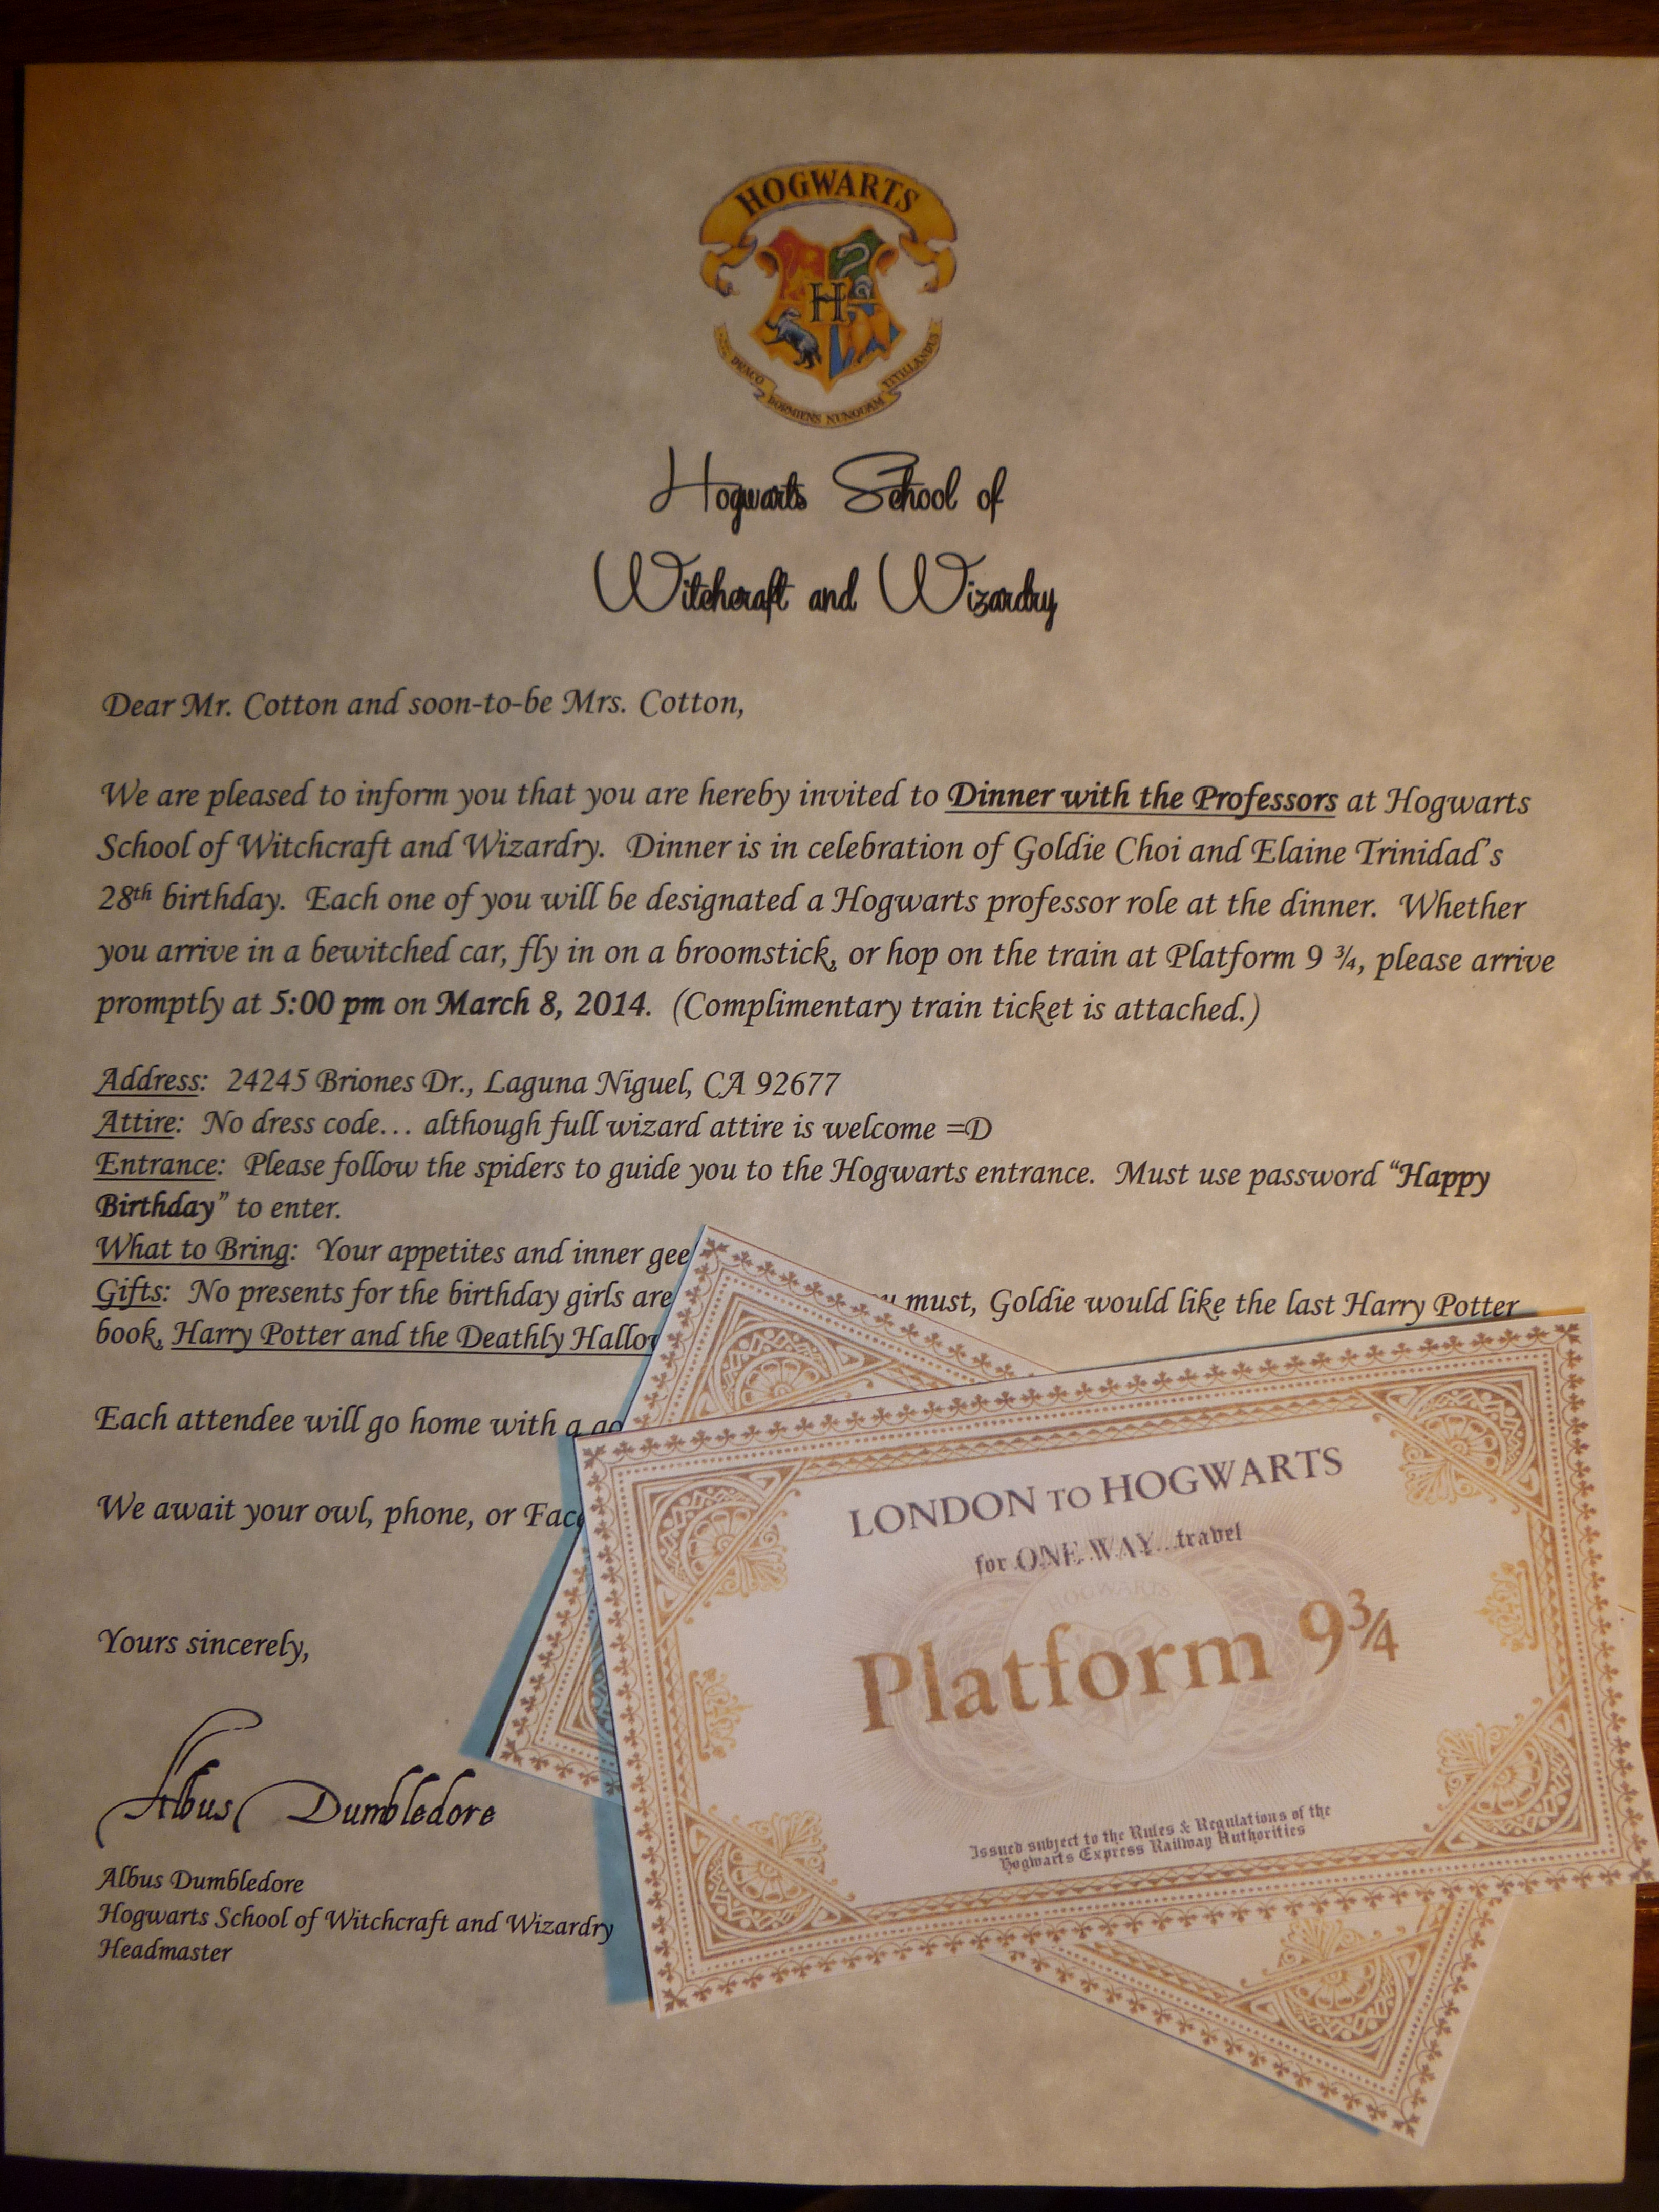 Harry Potter Hogwarts Invitation Lovely Owl Post Invitations — Harry Potter Party